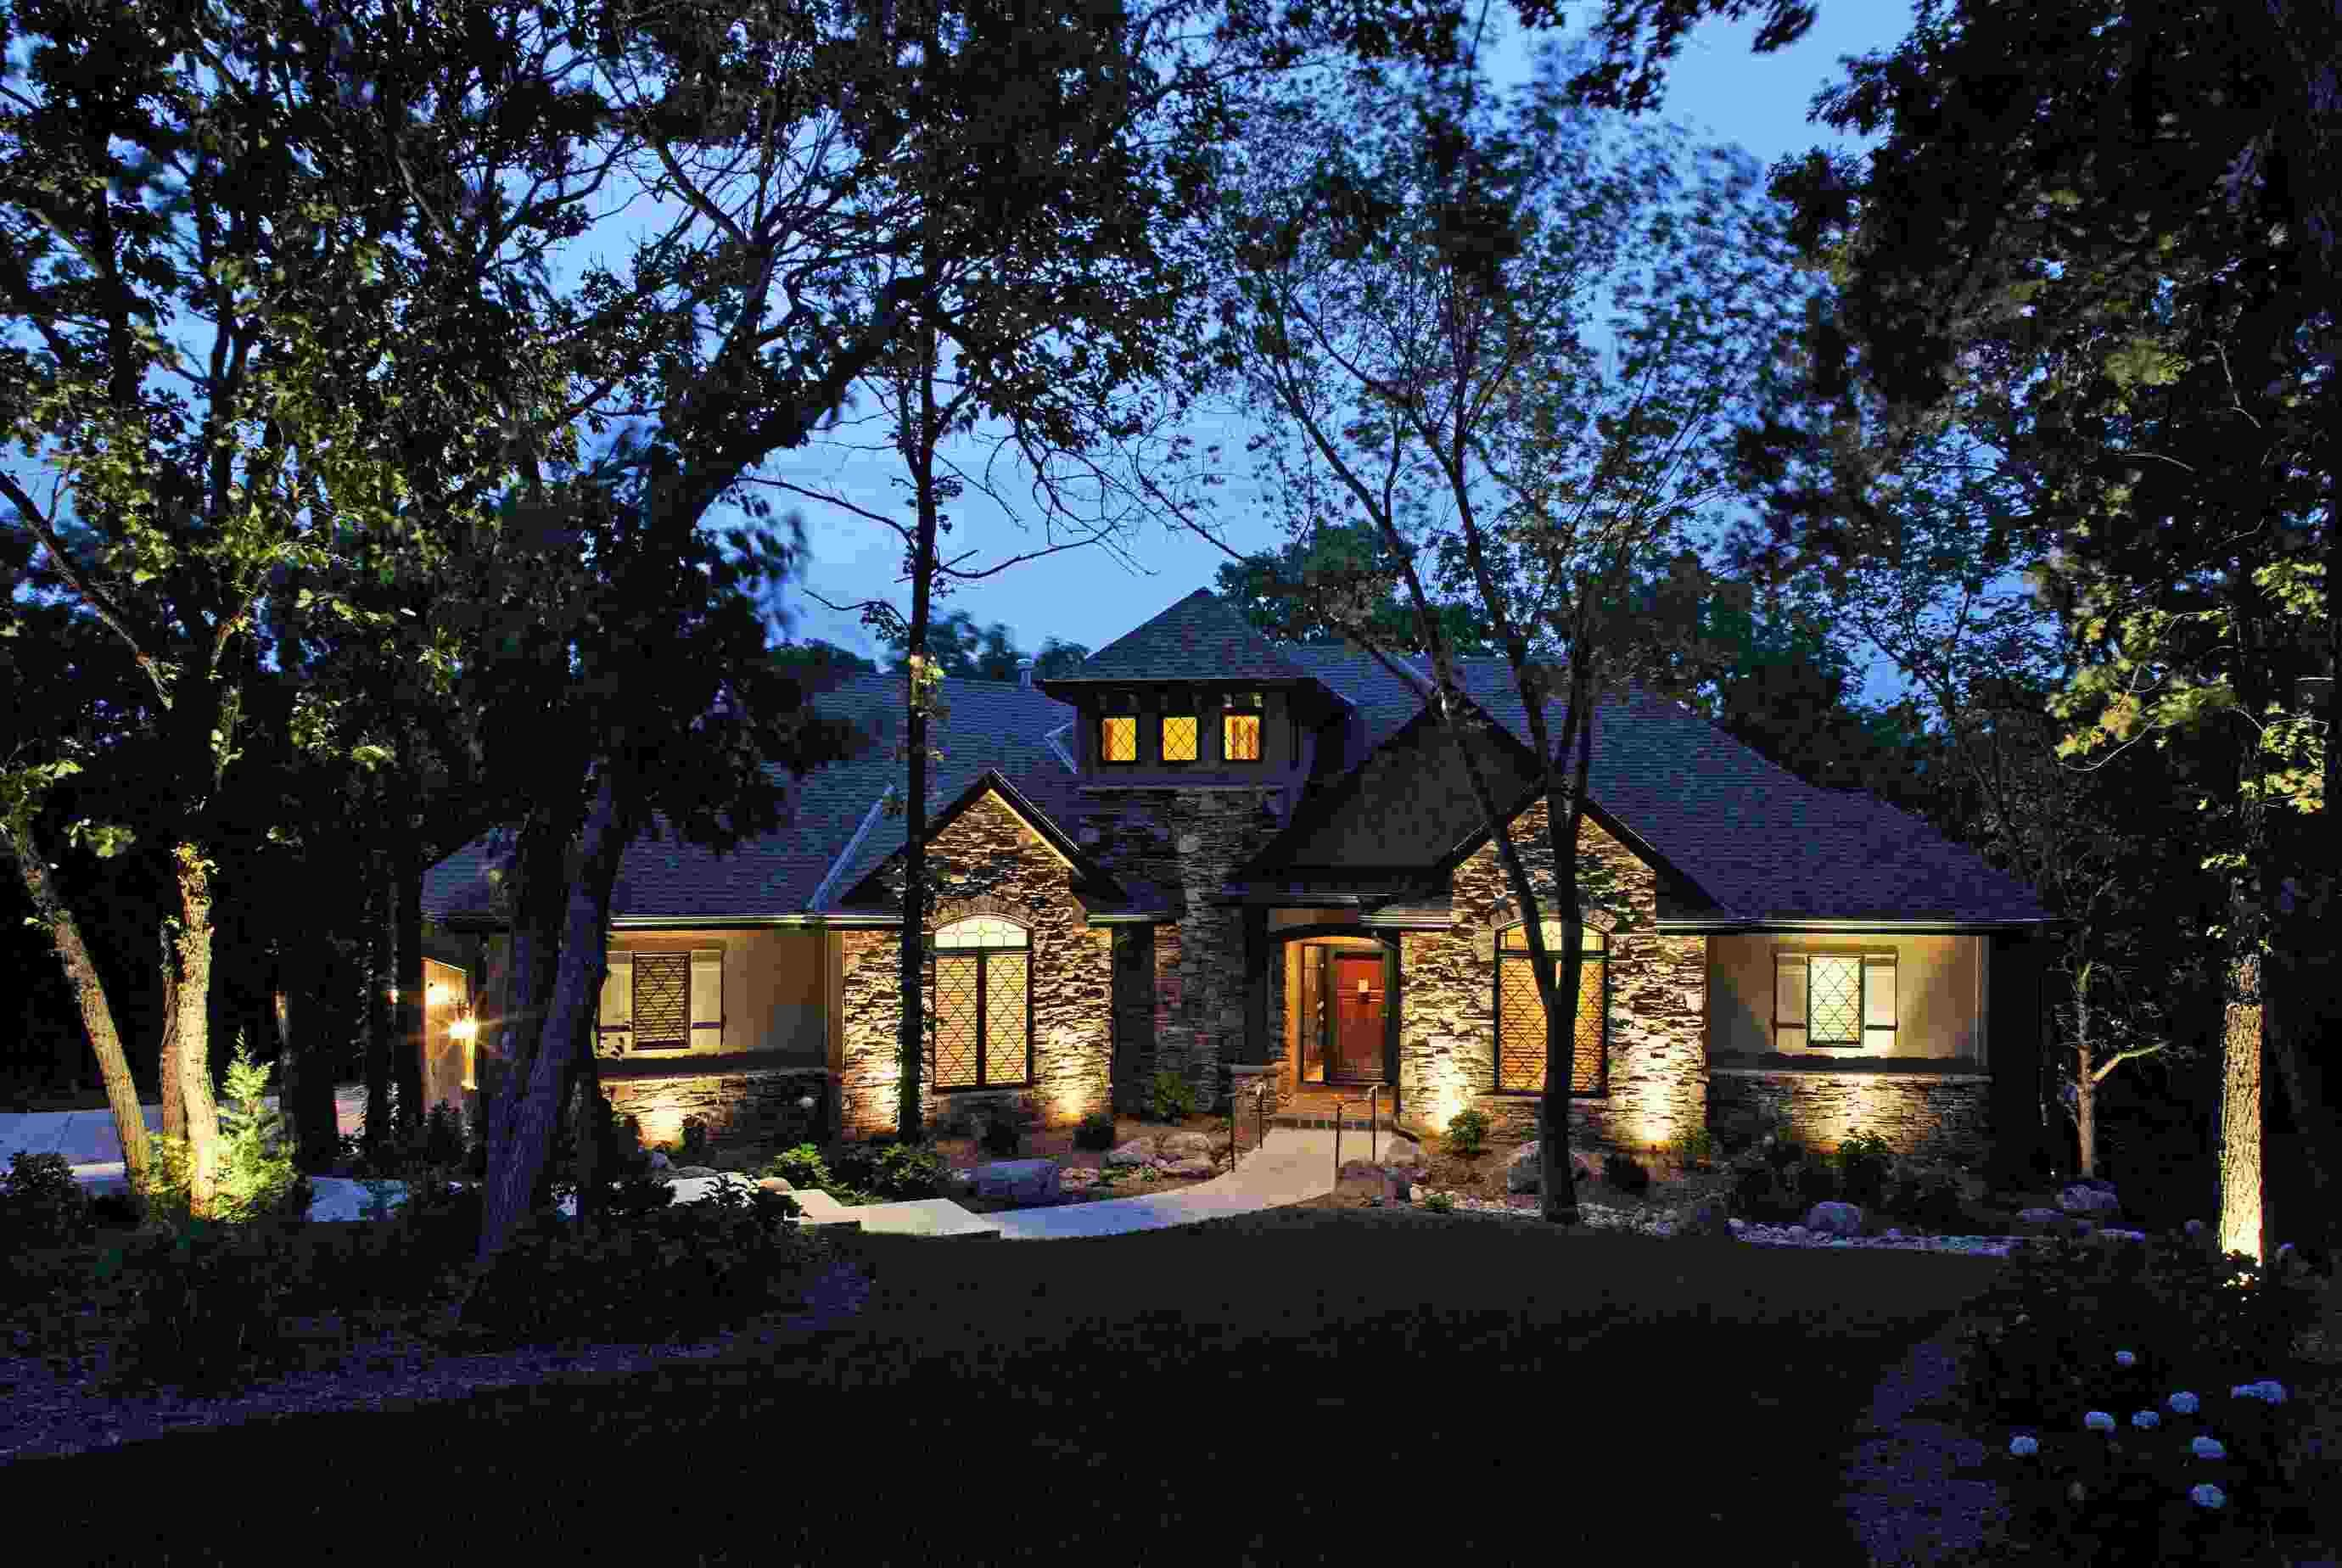 Landscape Lighting Enjoys The Limelight As One Of The Most Popular Upgrades Landscape Lighting Landscape Lighting Design Solar Landscape Lighting